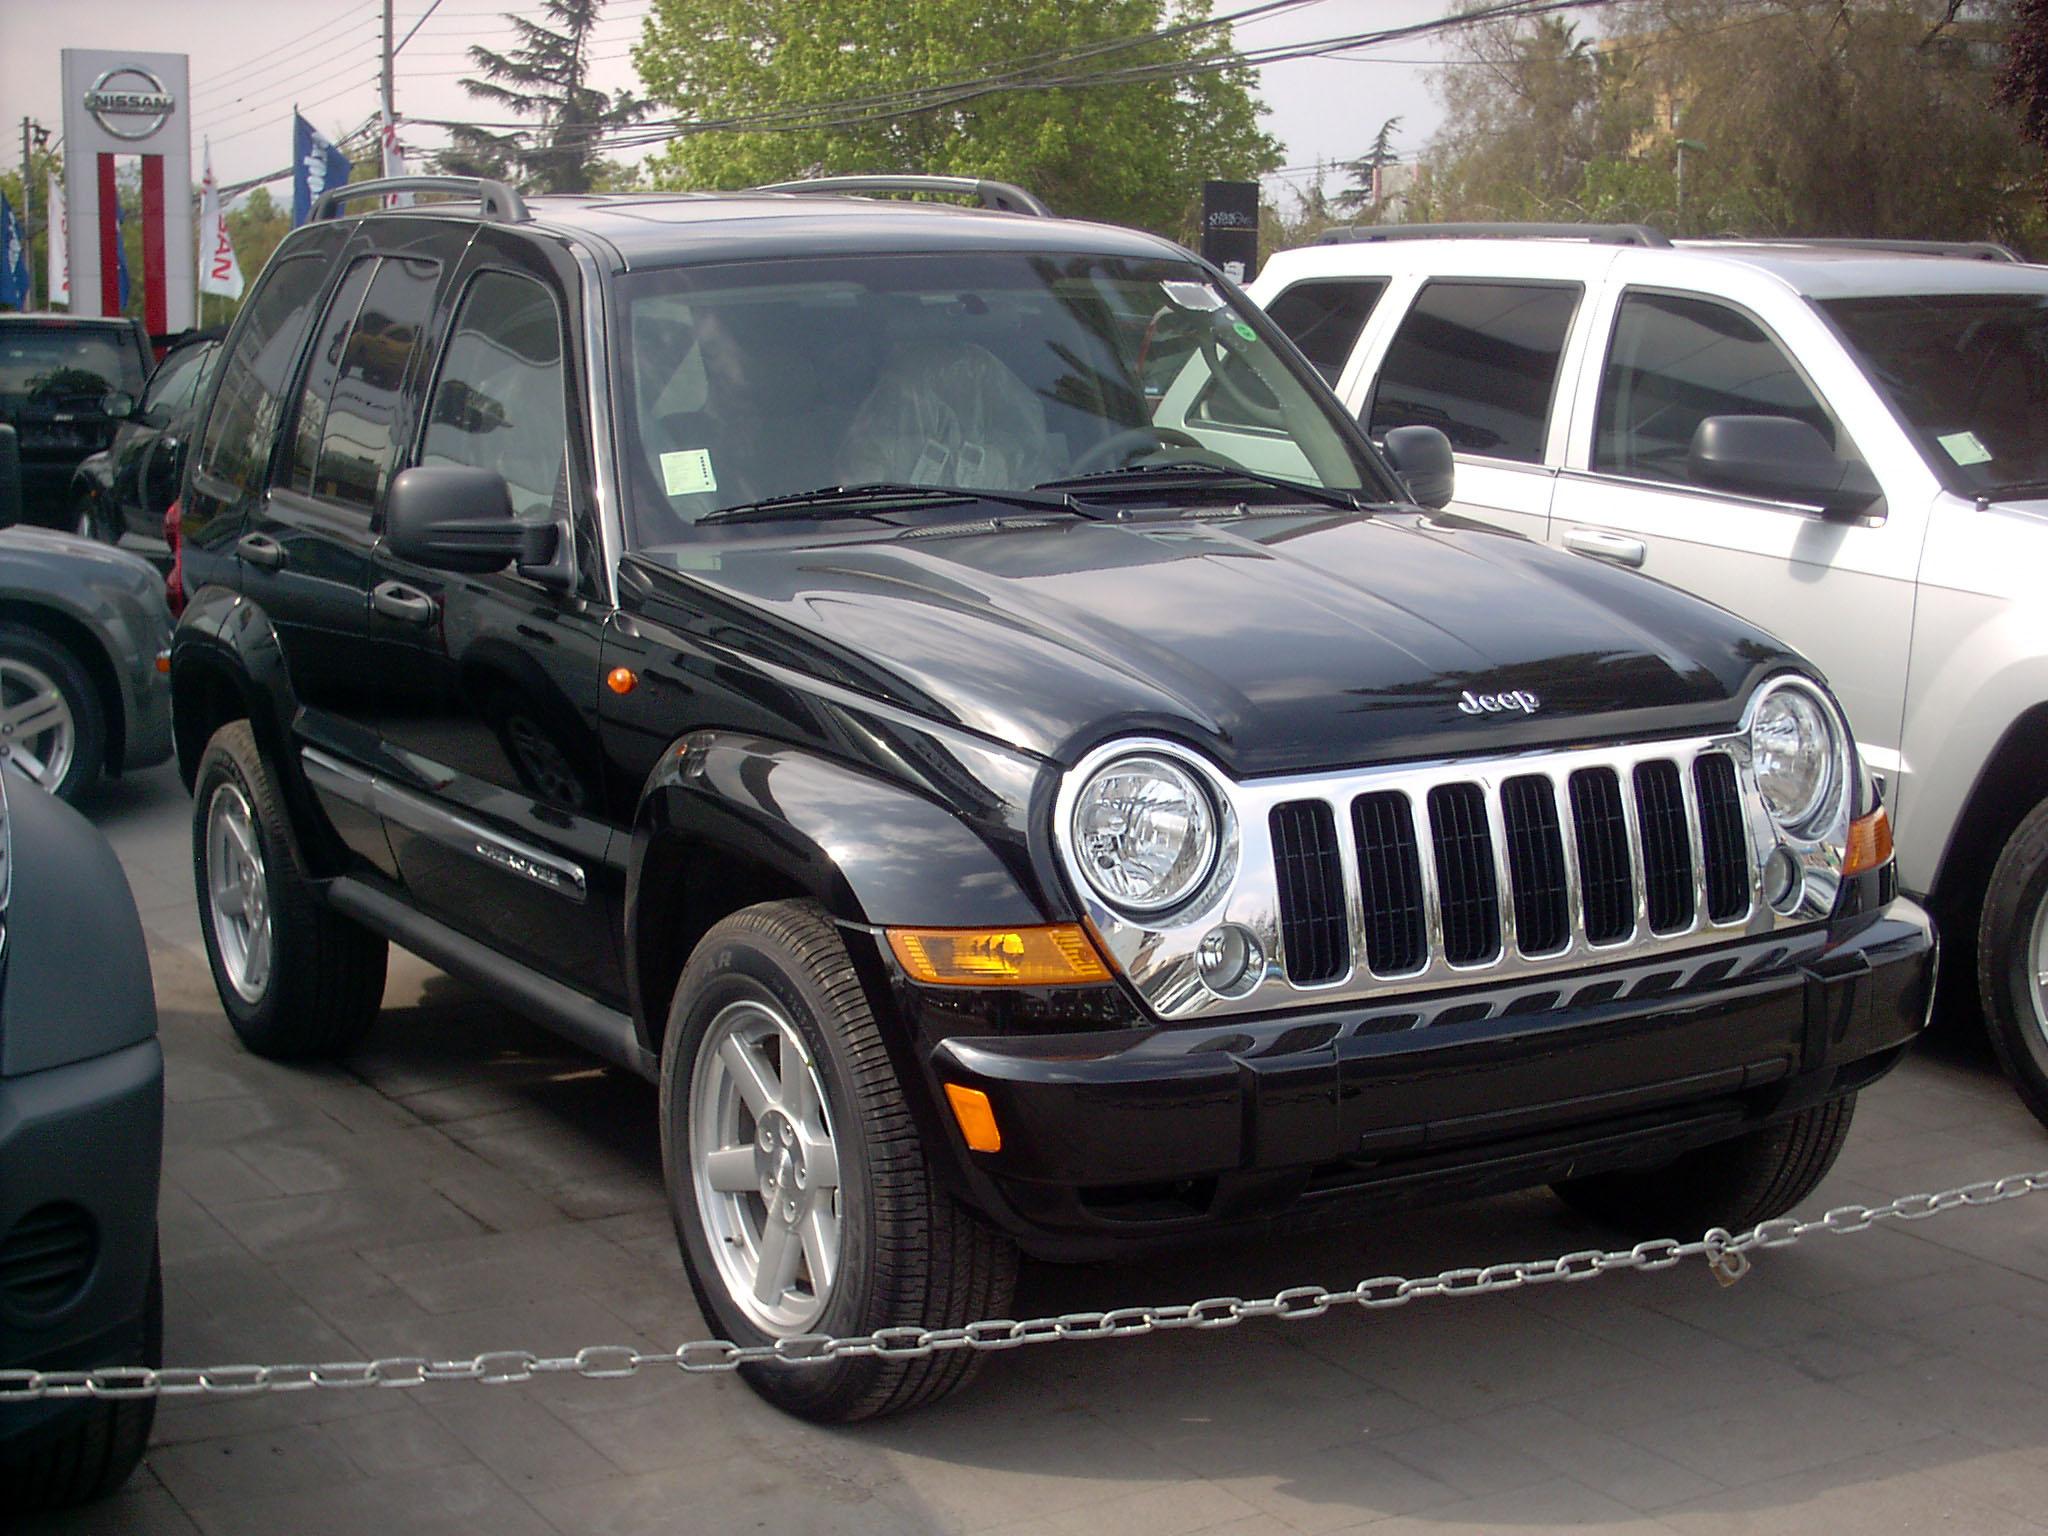 file:jeep cherokee 3.7l limited 2007 (10392857073) - wikimedia